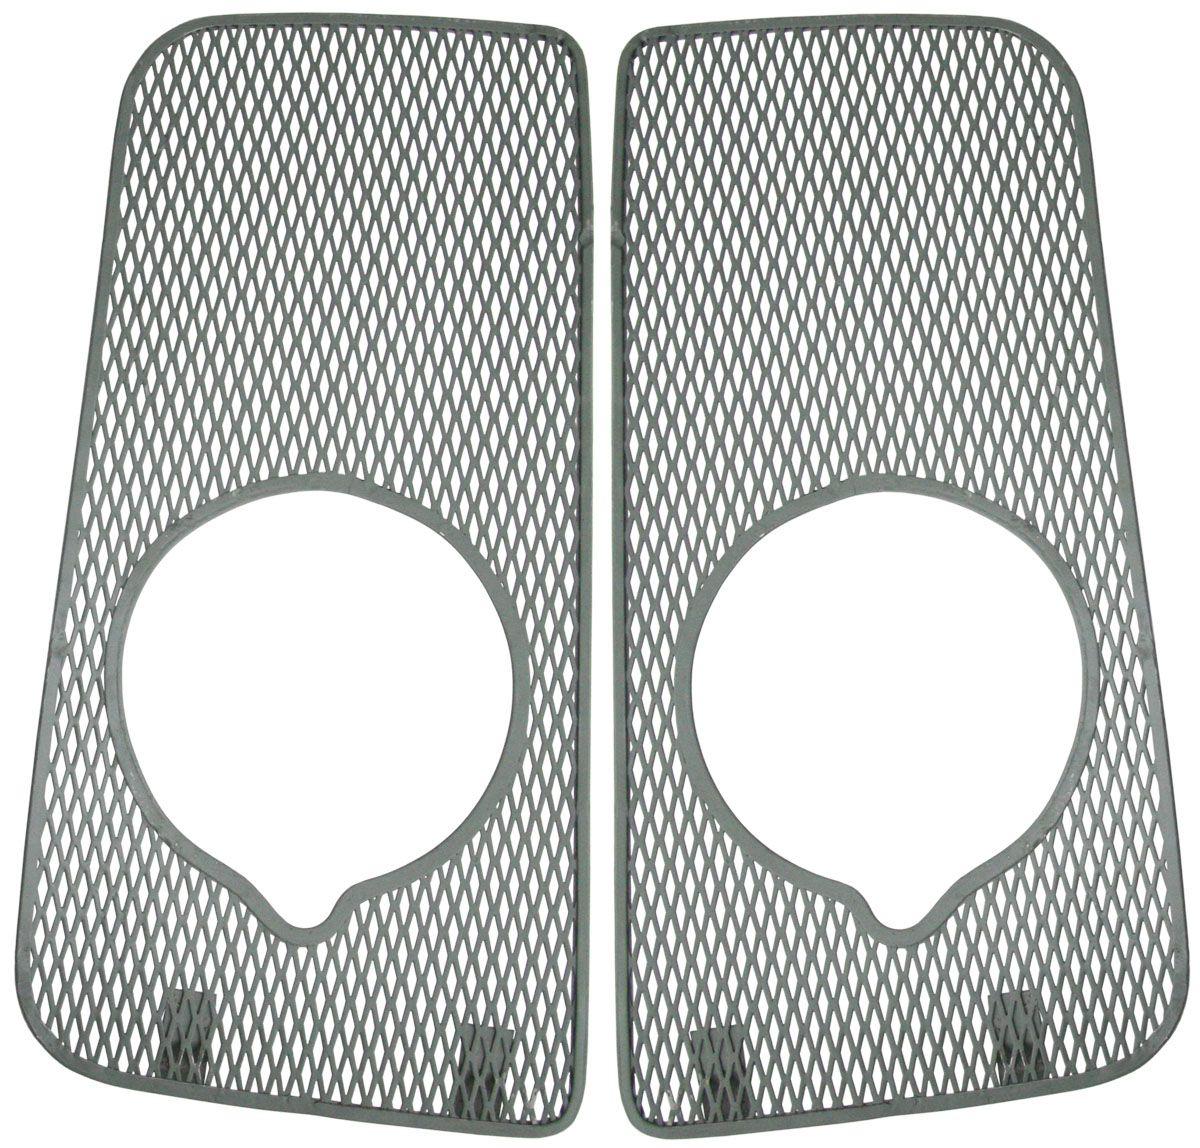 EMMARK FORDSON GRILL SET - (E1ADKN8164A)